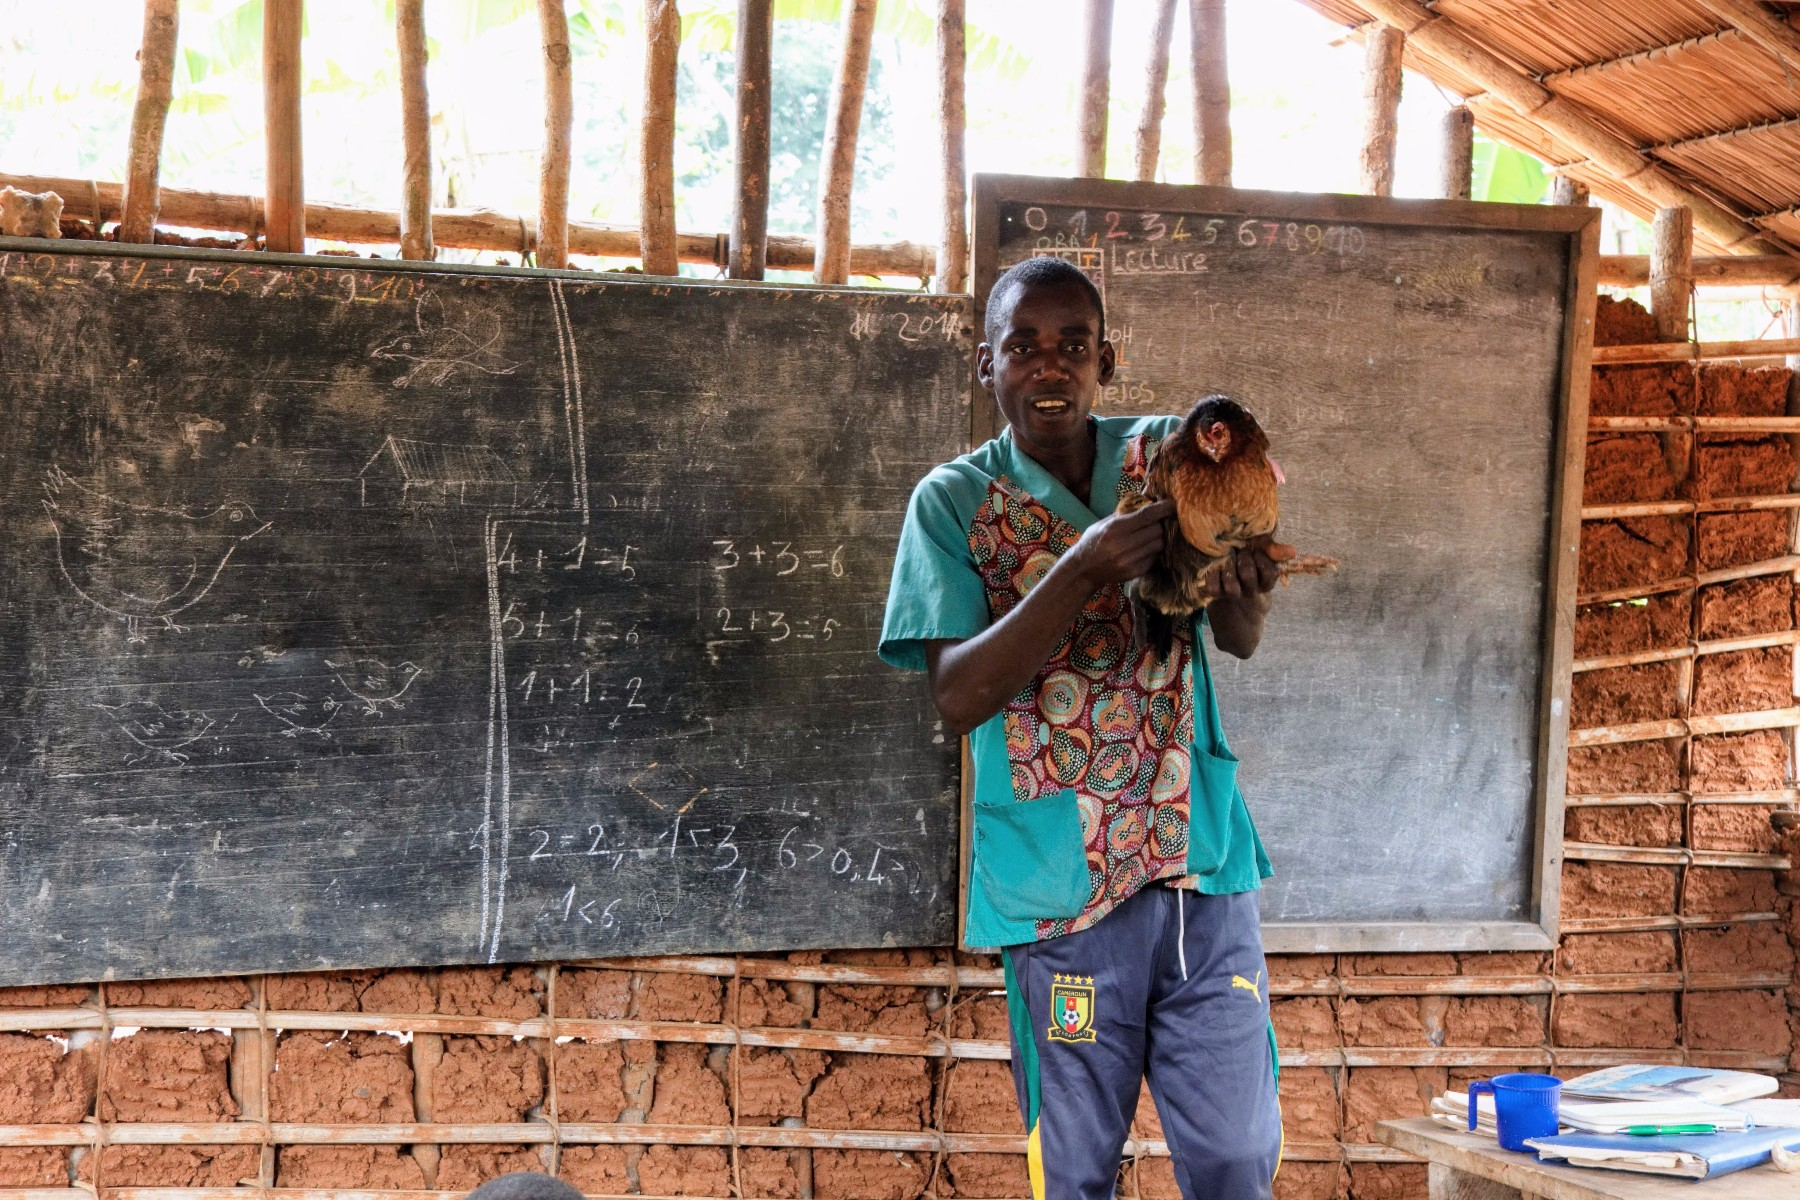 profesor sur de camerun